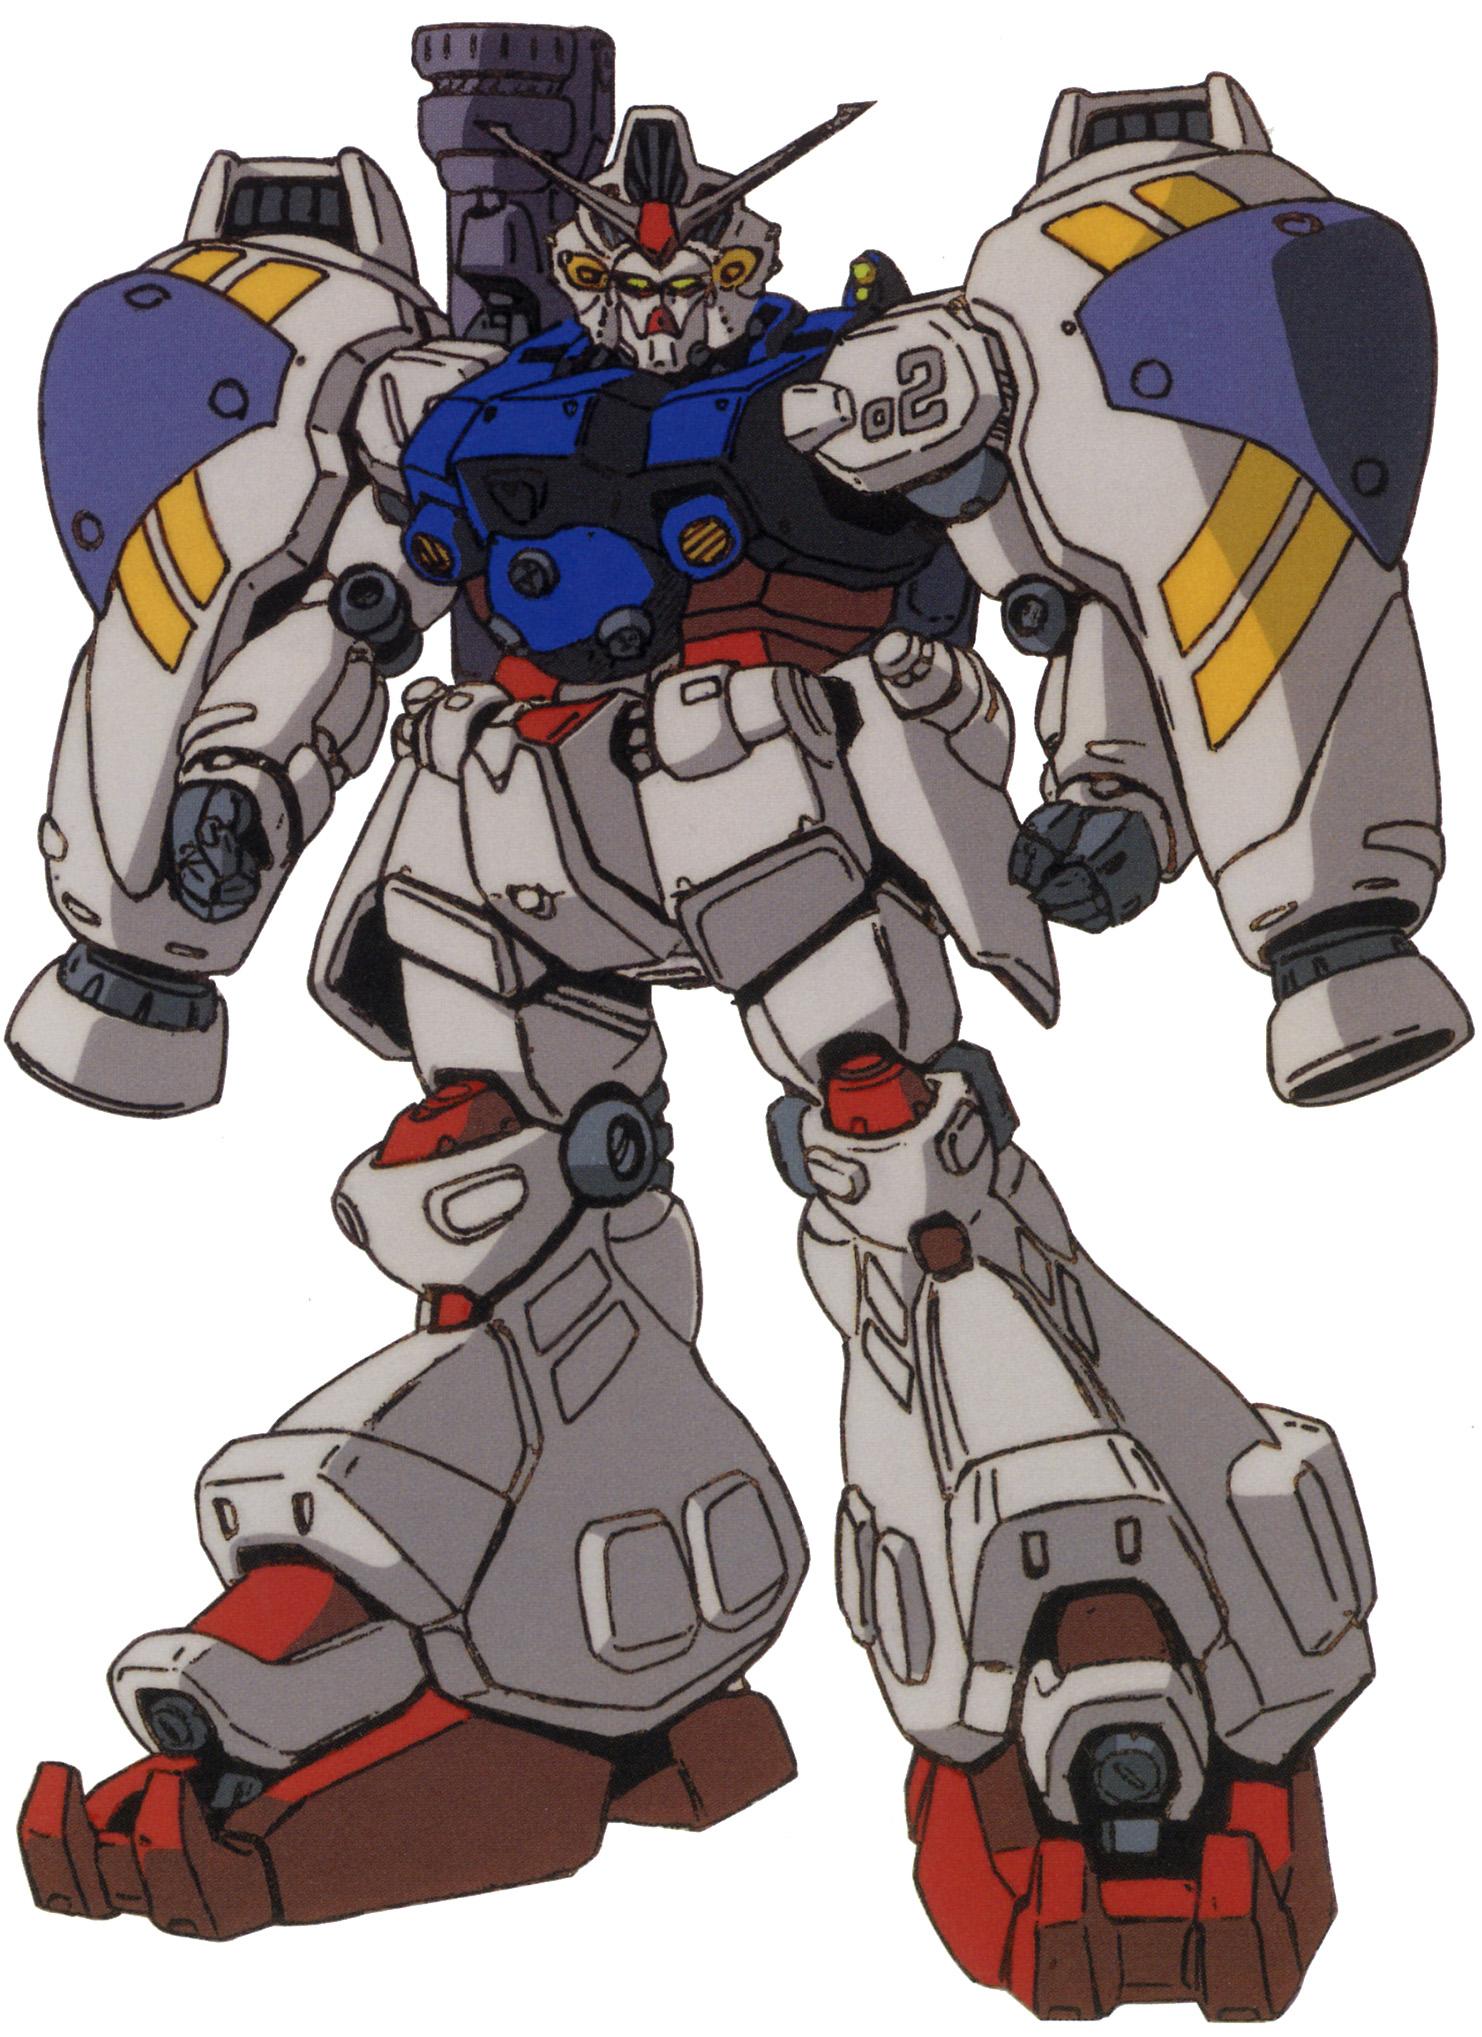 Rx 78gp02a Gundam Physalis The Wiki Fandom Powered By Wikia Hg Mechanics Dendrobium Front